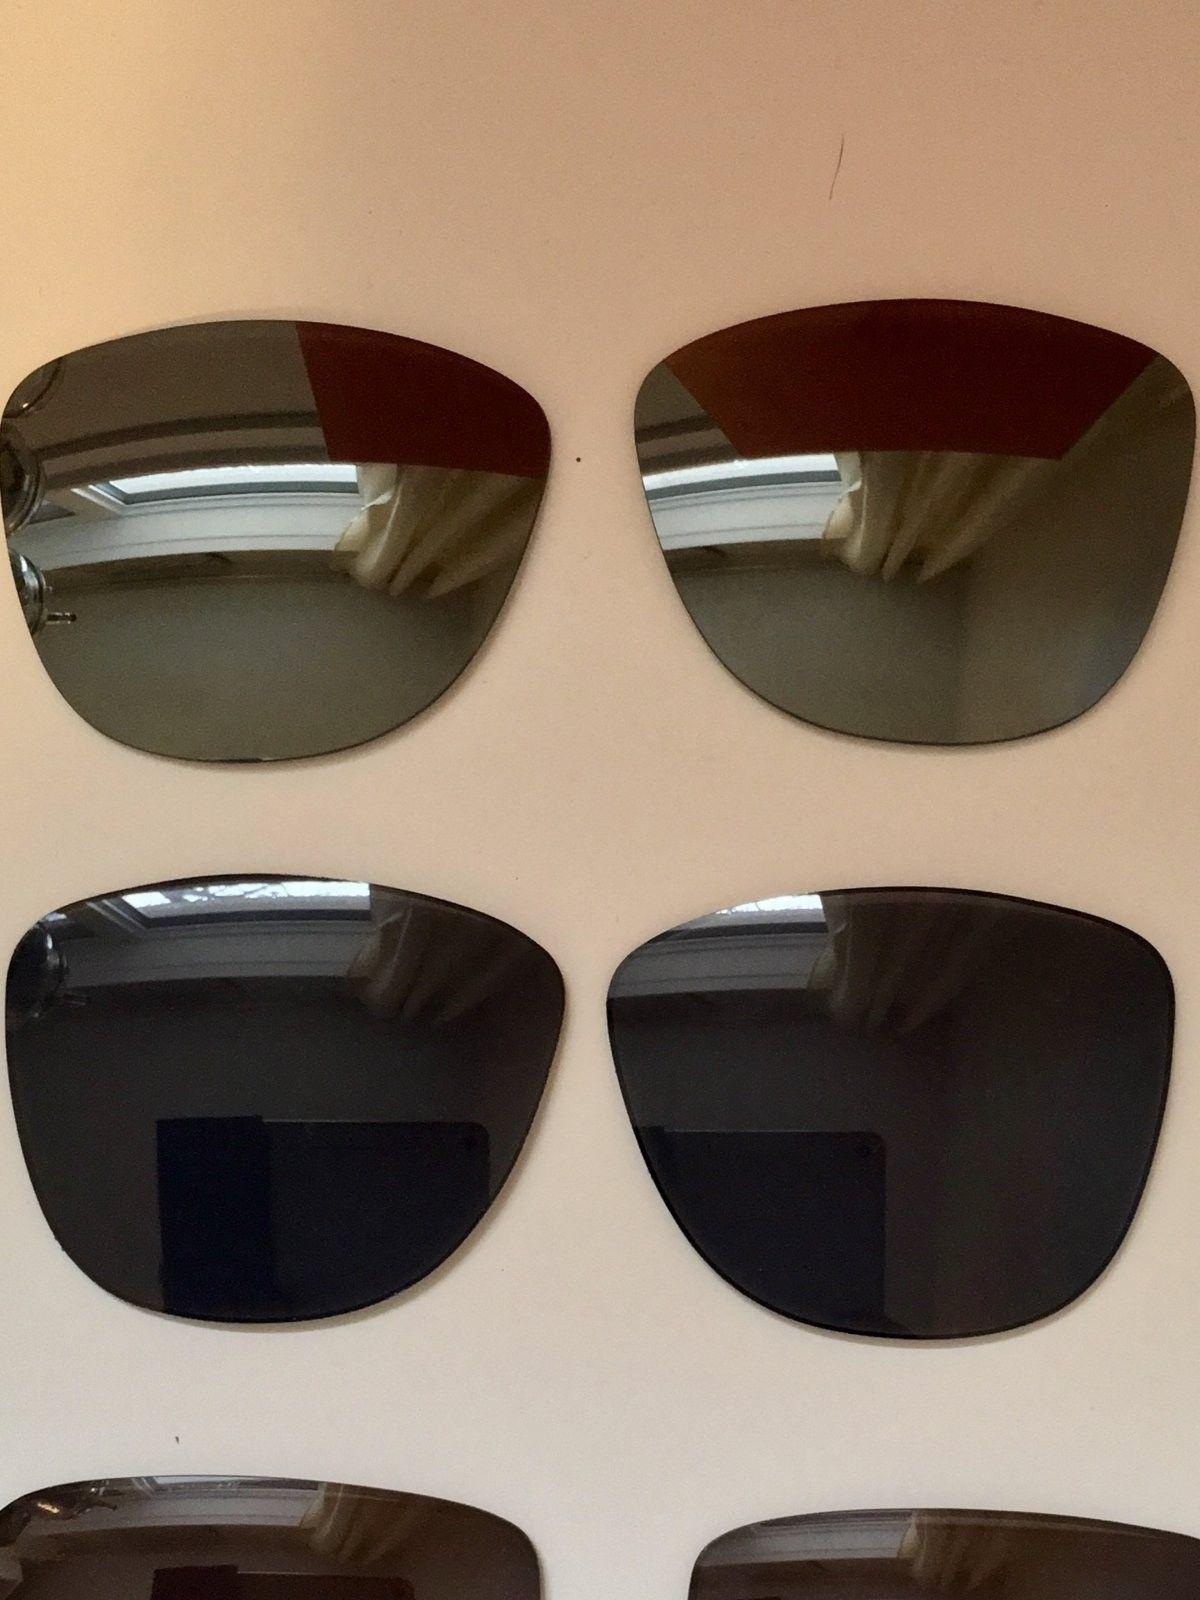 2 pairs of frogskin lenses $30 - image.jpeg